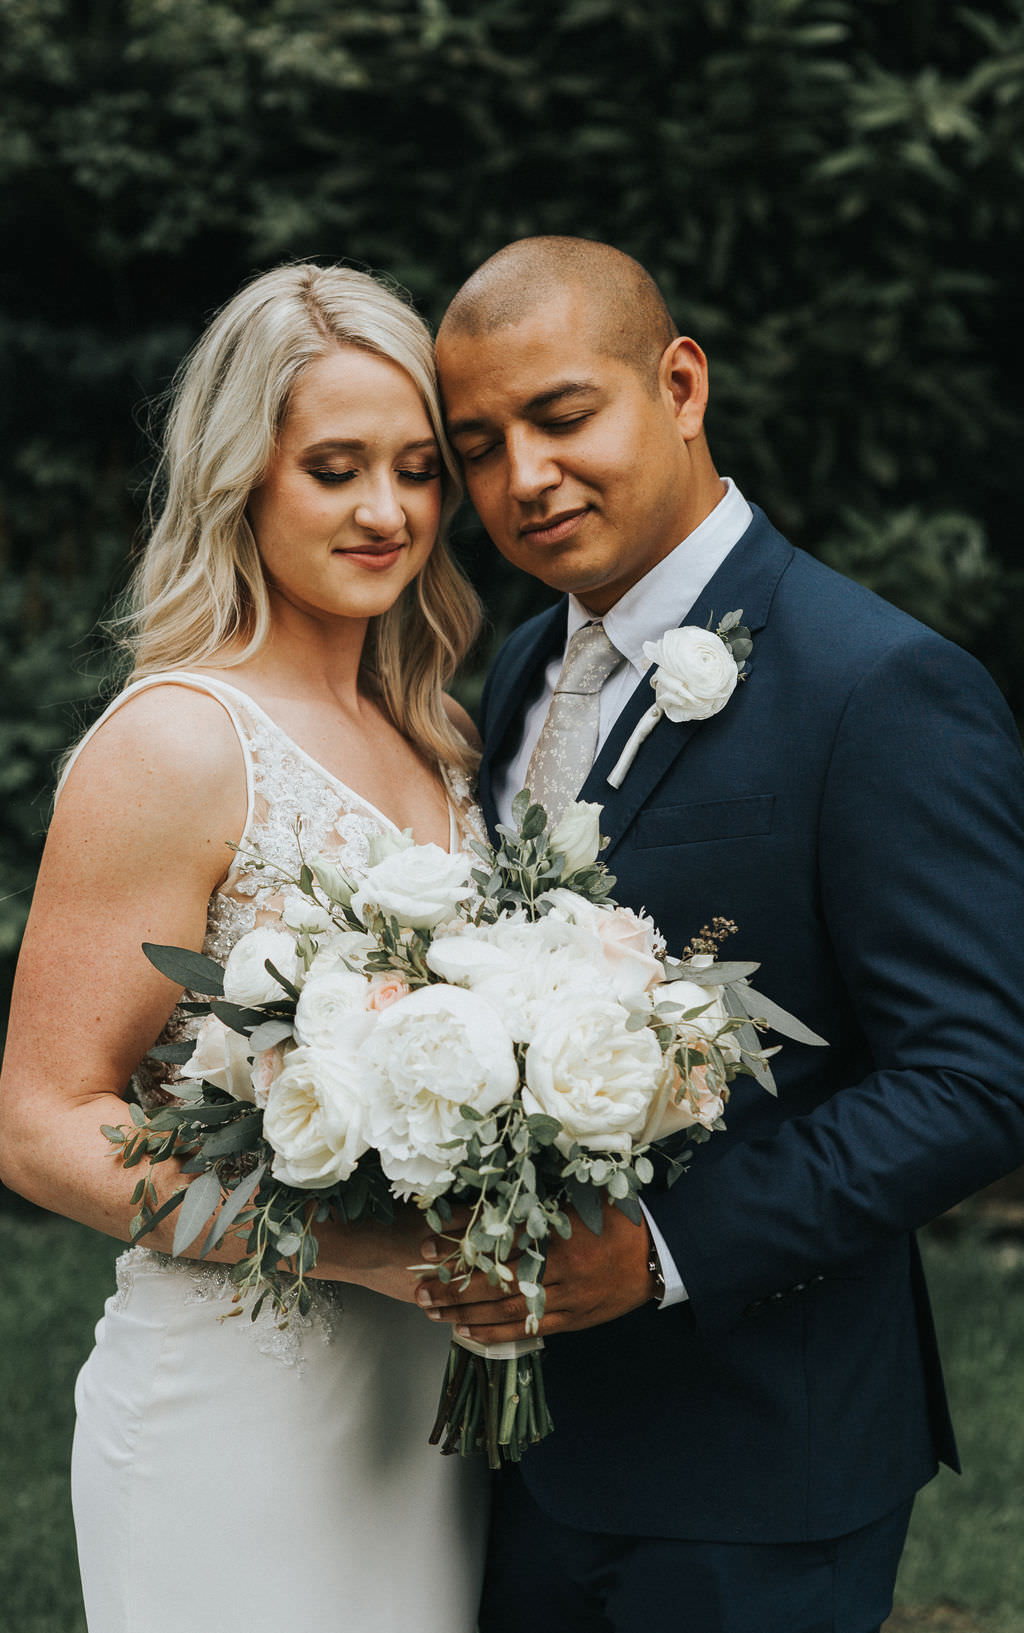 Bouquet Flowers Bride Bridal White Peony Peonies Rose Greenhouse Garden Washington Wedding Beginning and End Photography